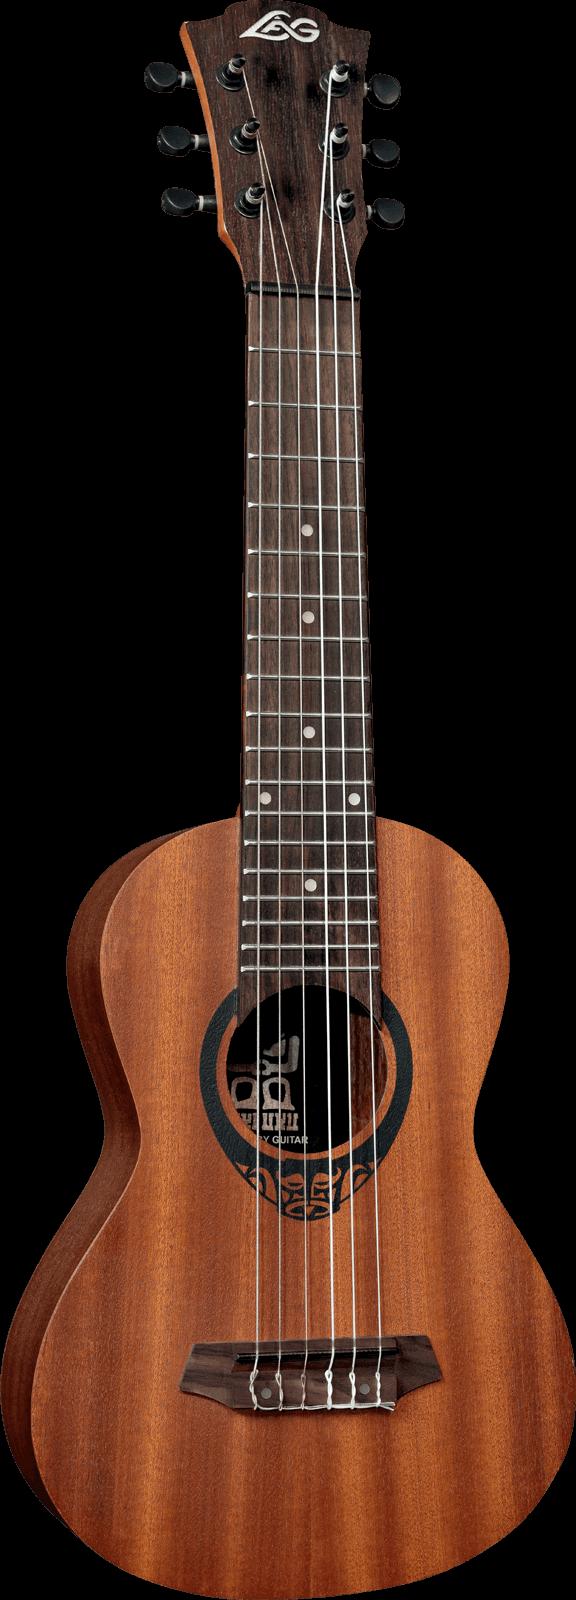 Lâg Baby guitar TKT8